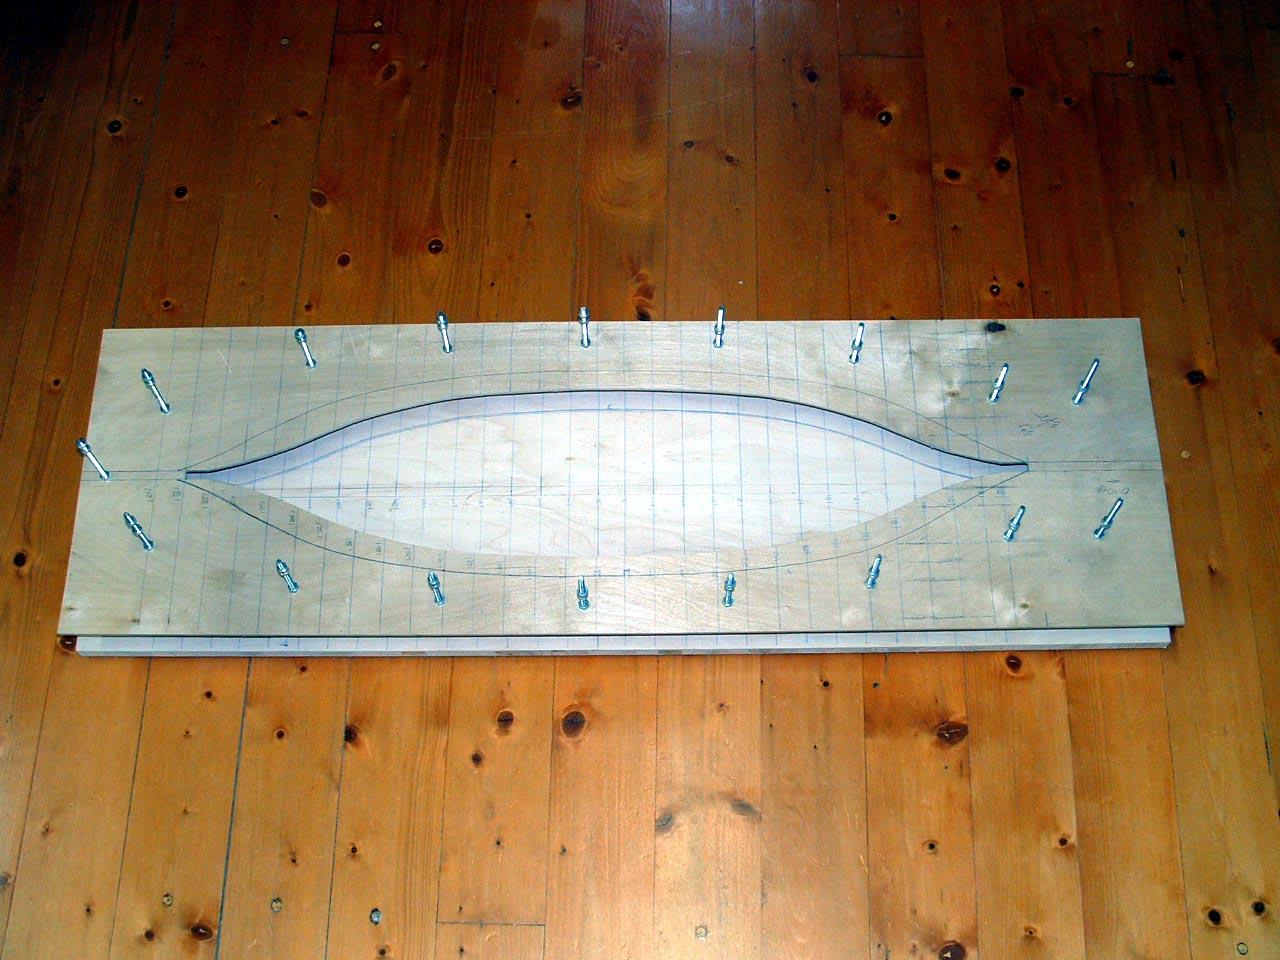 Chebec Le Requin - 1750 1004